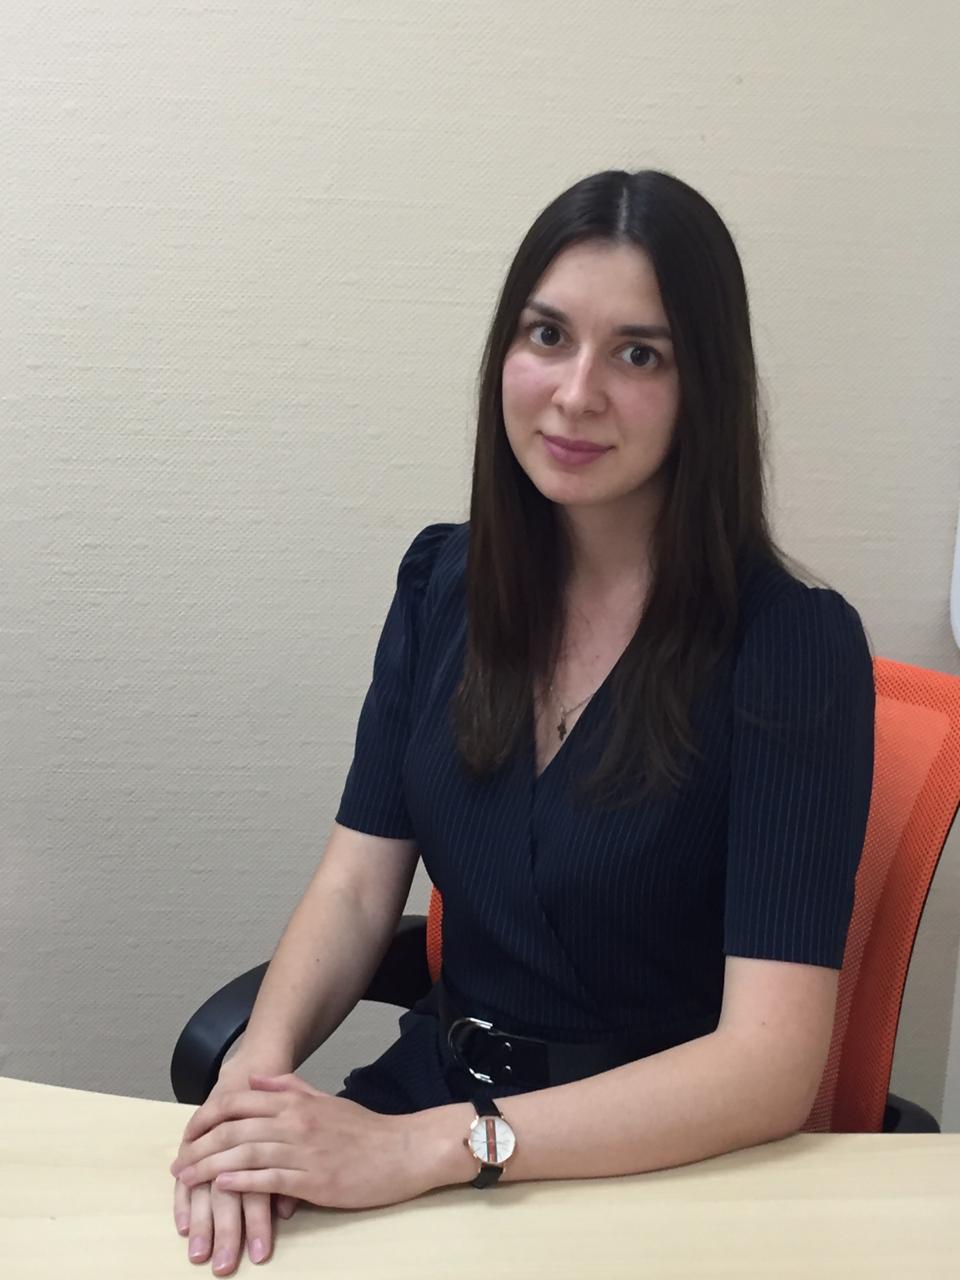 Тюрнева Валентина Борисовна